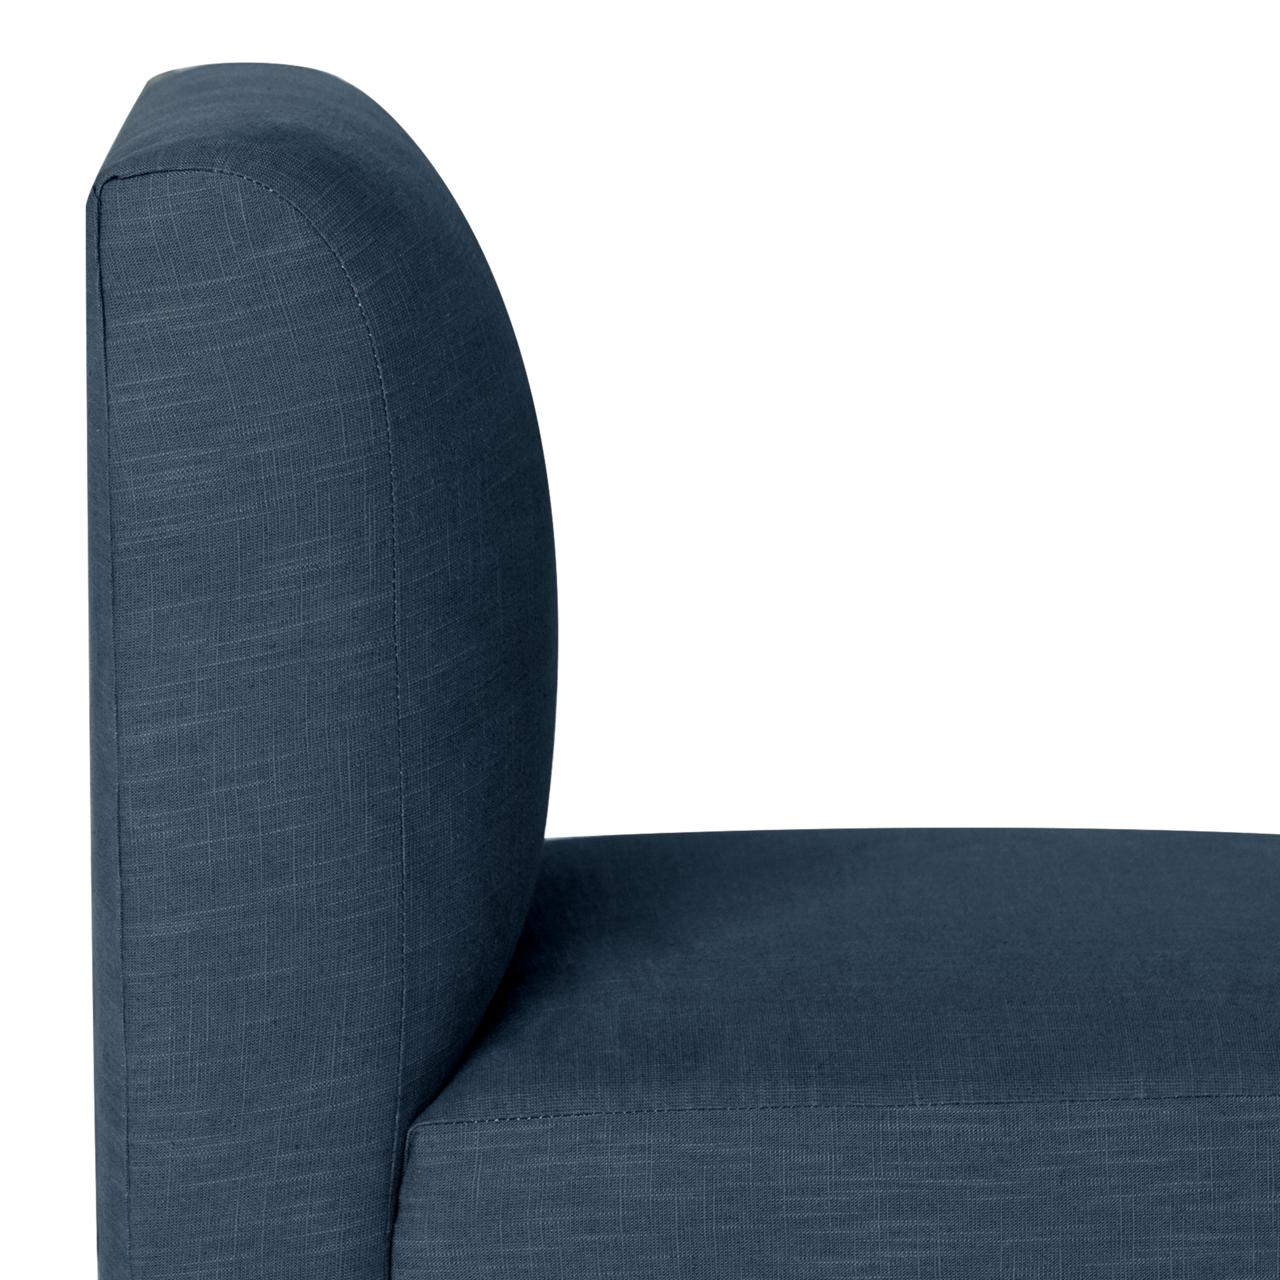 Dahlia Dining Chair, Linen Navy